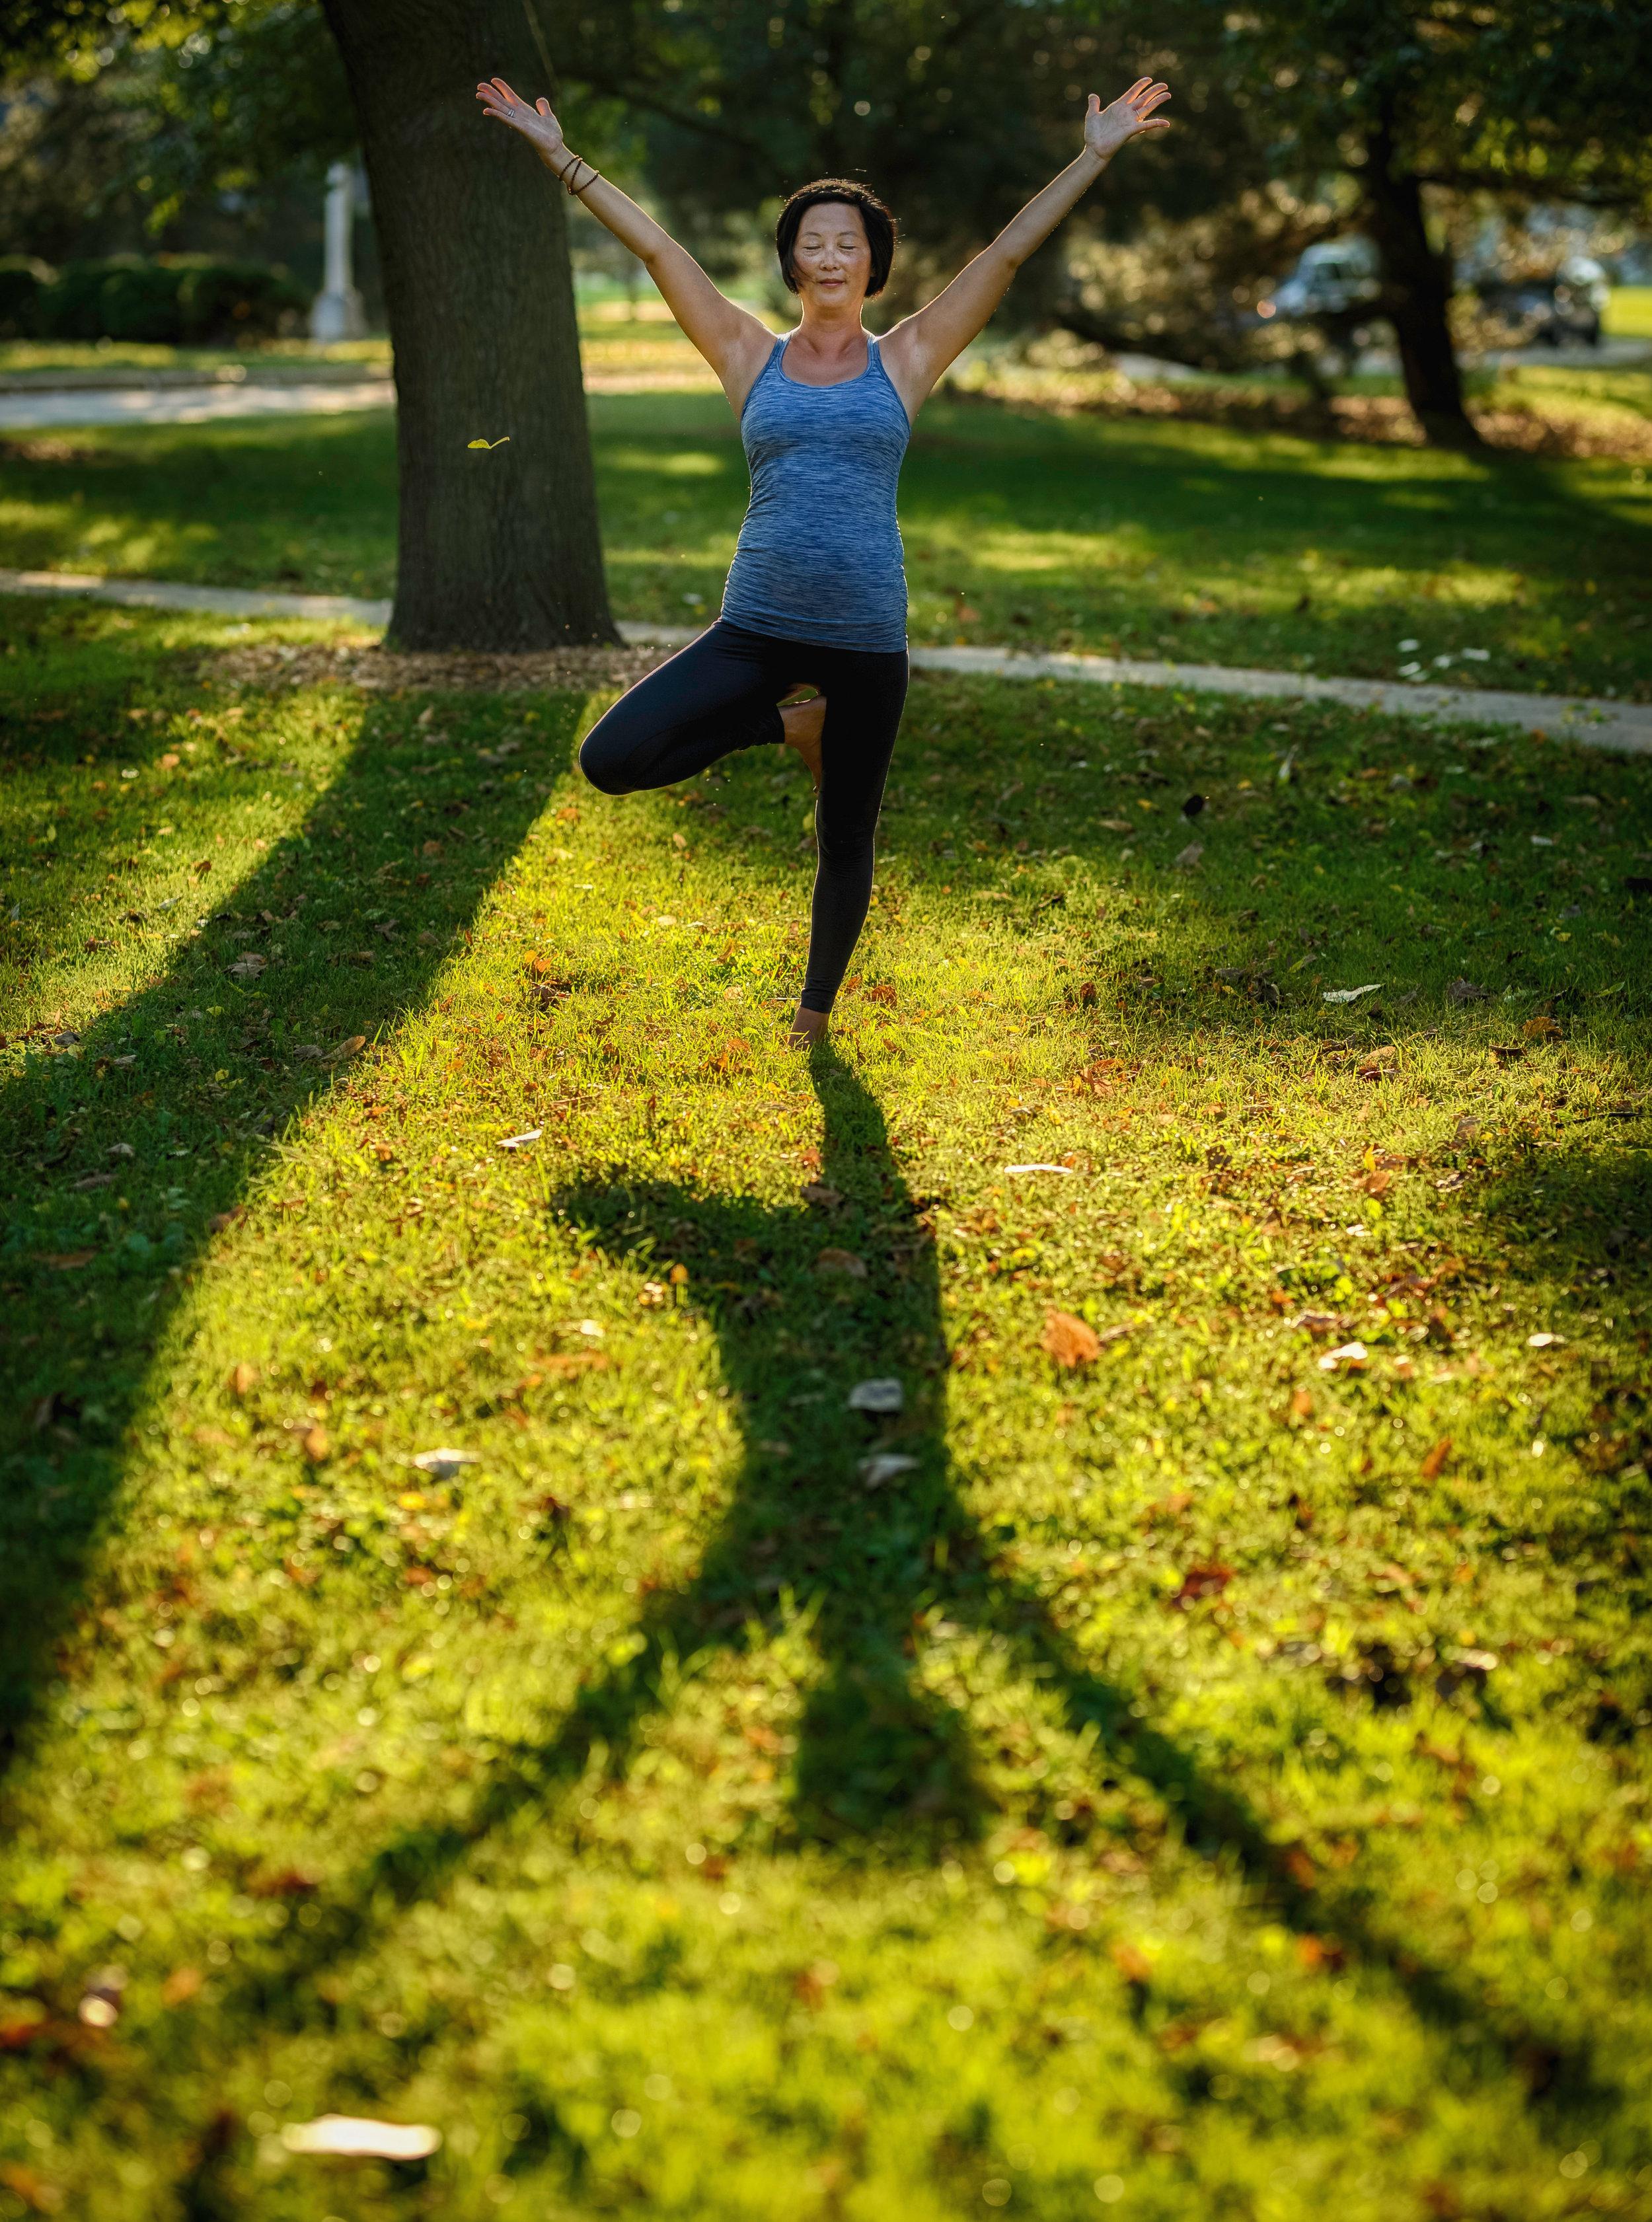 092517 Vahlsing yoga 000068_HDR-Edit-Edit.jpg